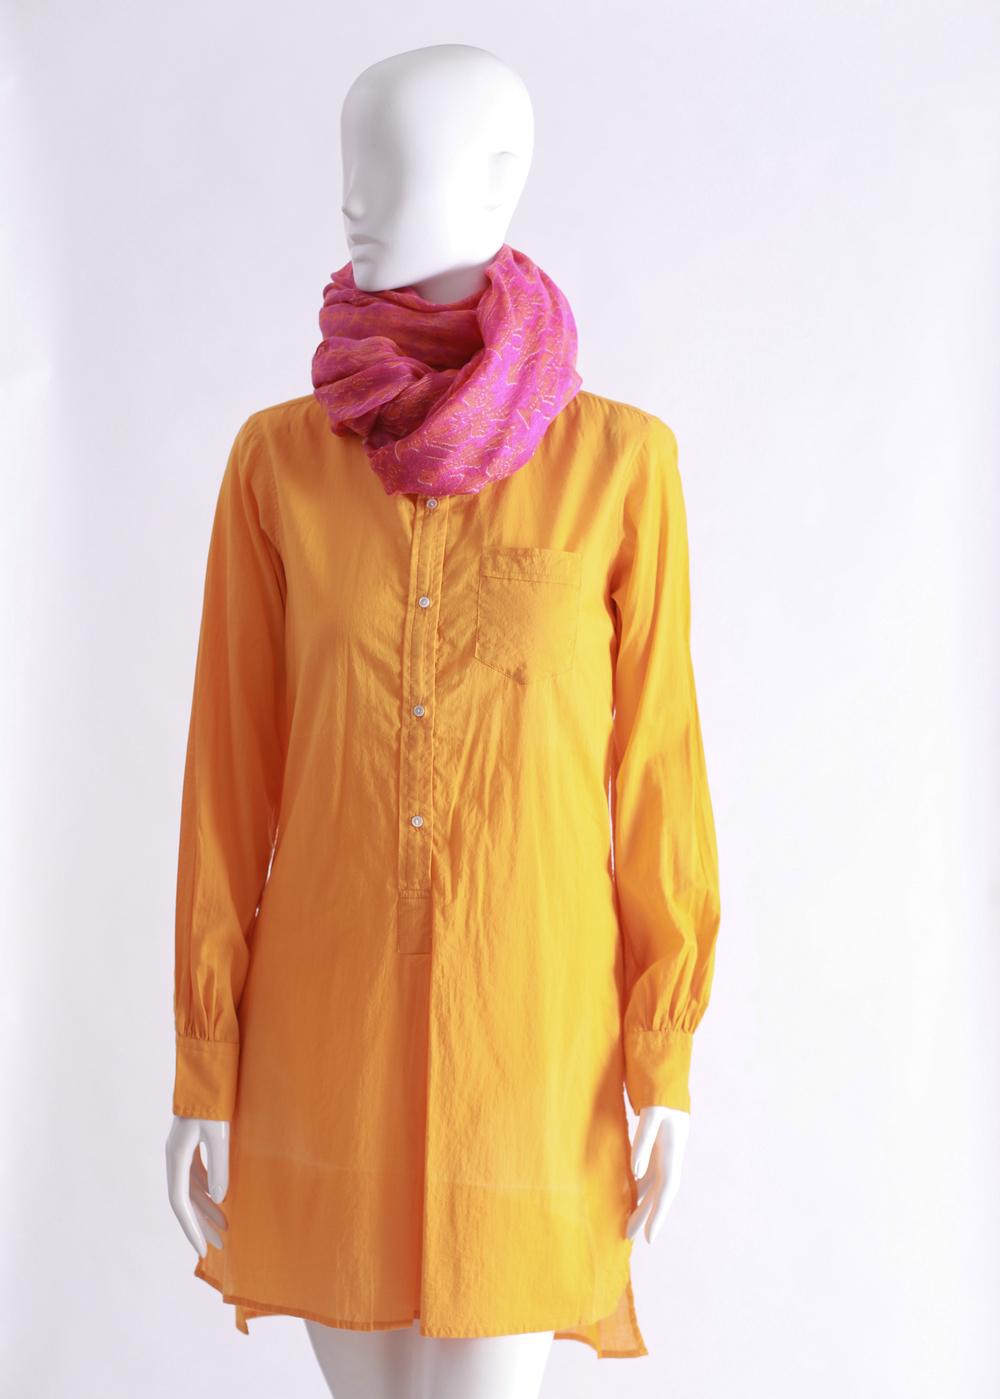 Nili Lotan orange tunic,paired with a Bajra cashmere scarf.